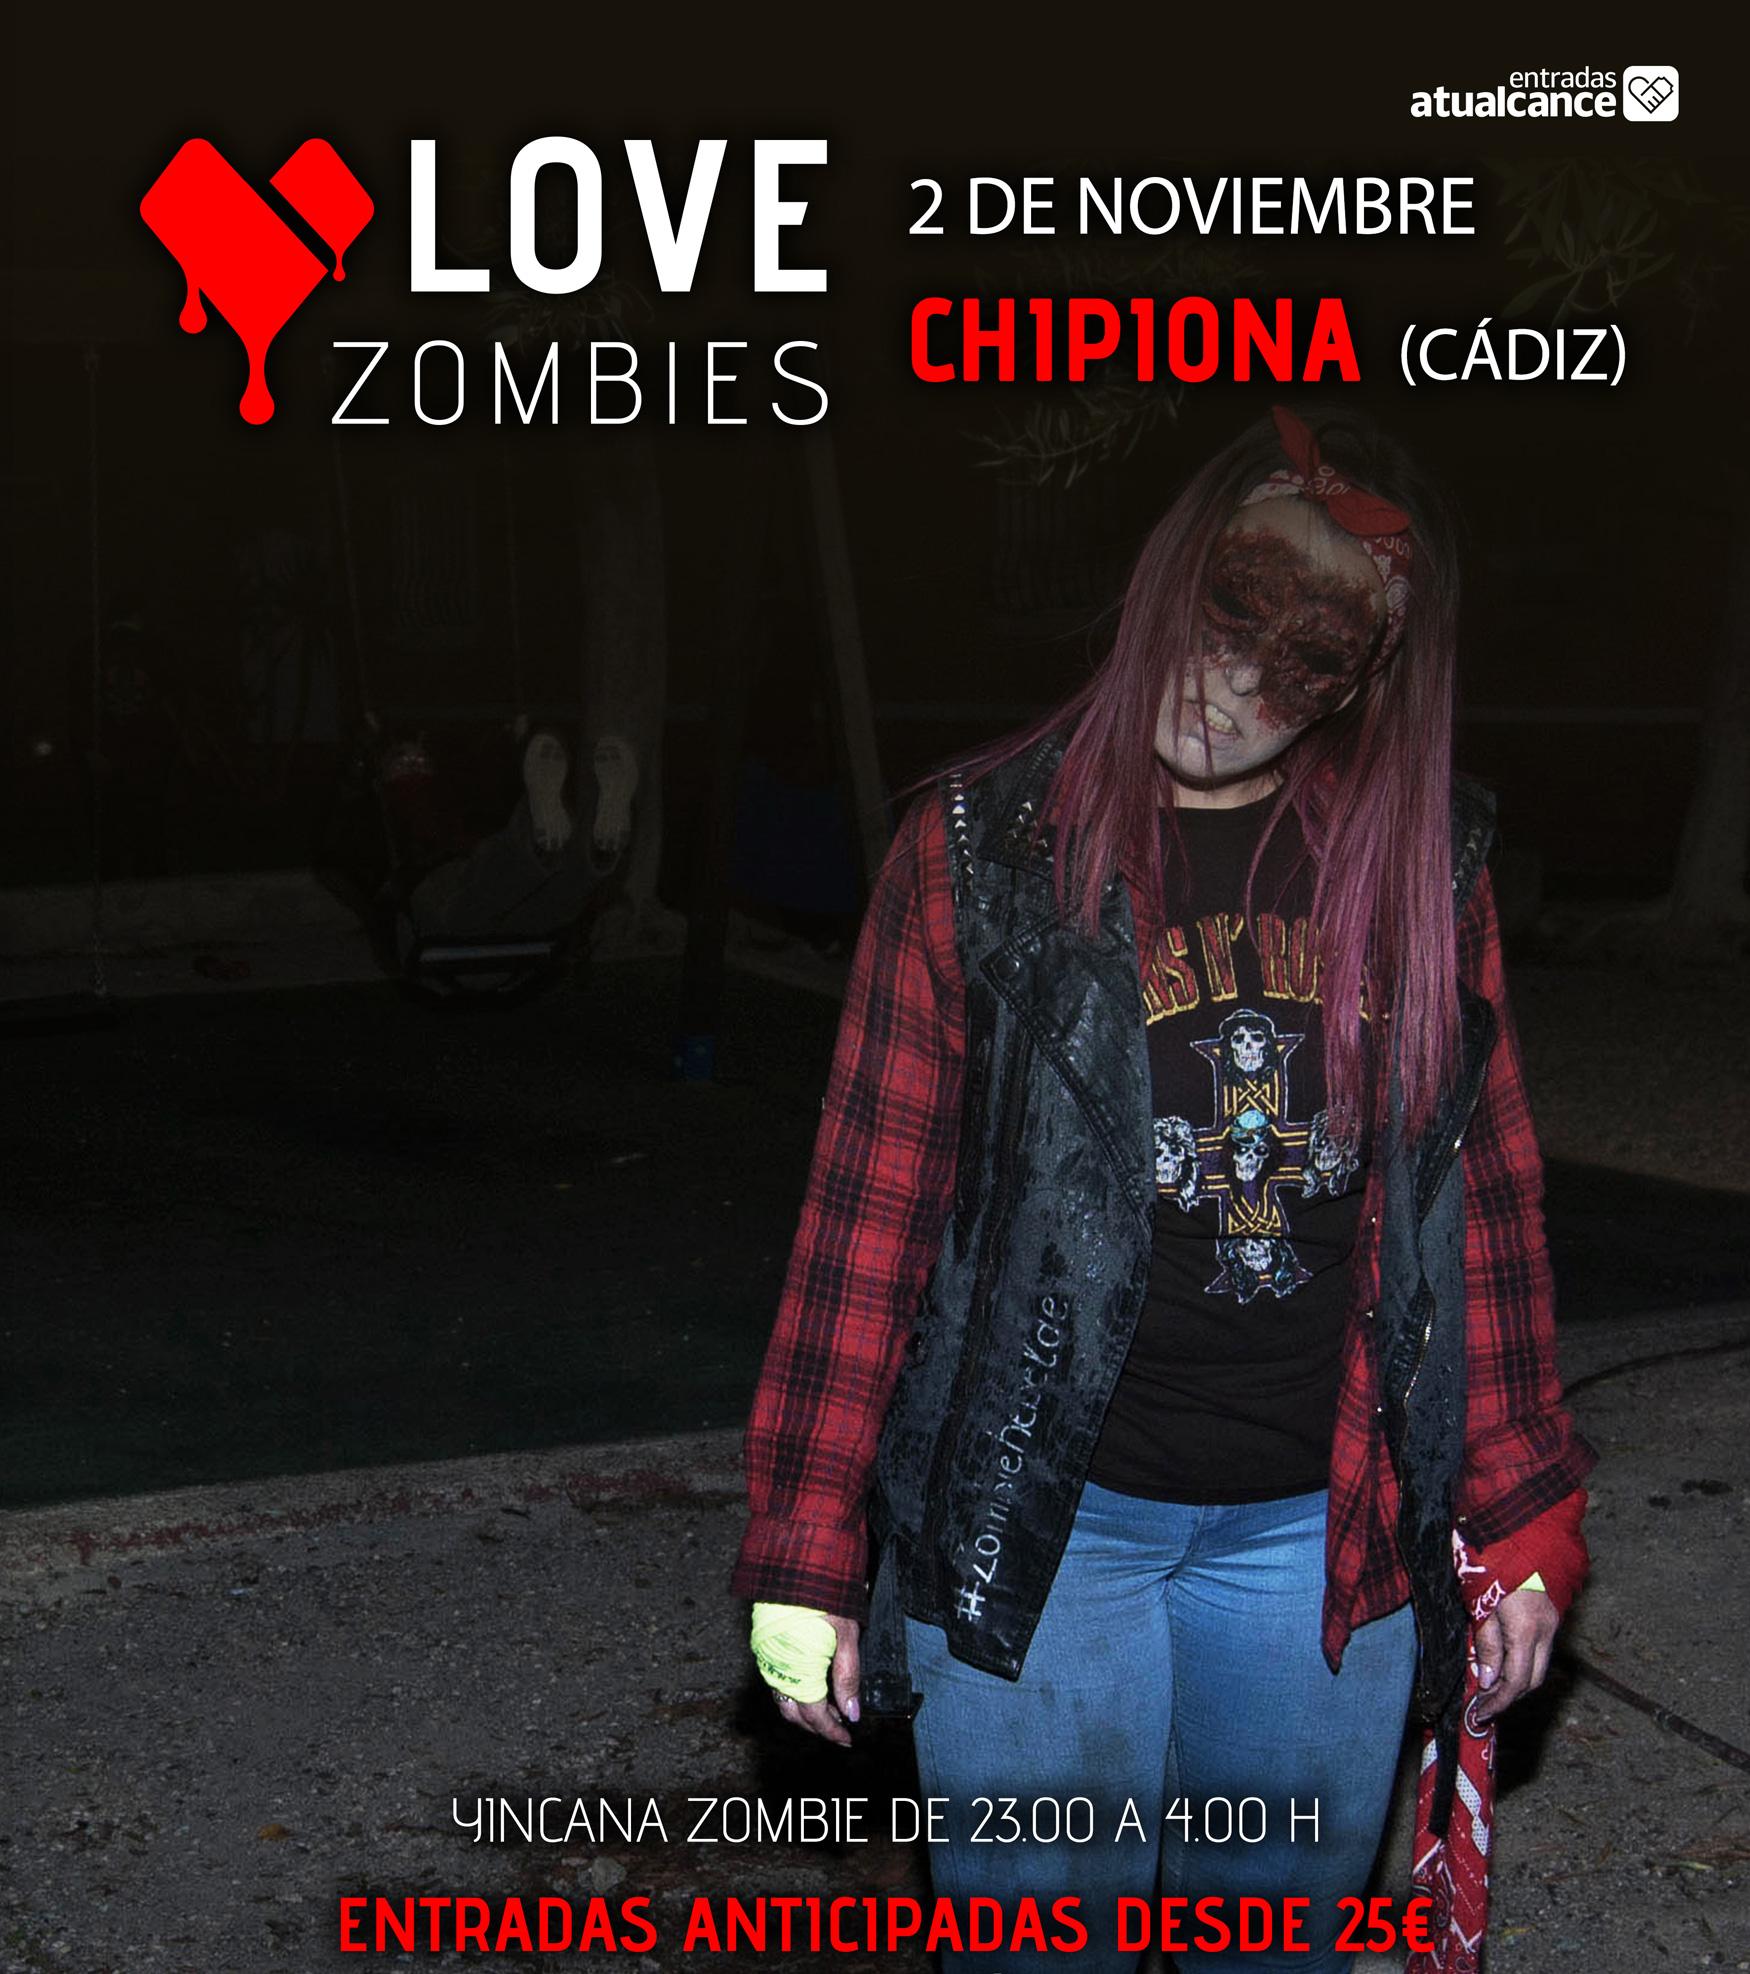 love-zombie-chipiona-5d80ec4b20867.jpeg